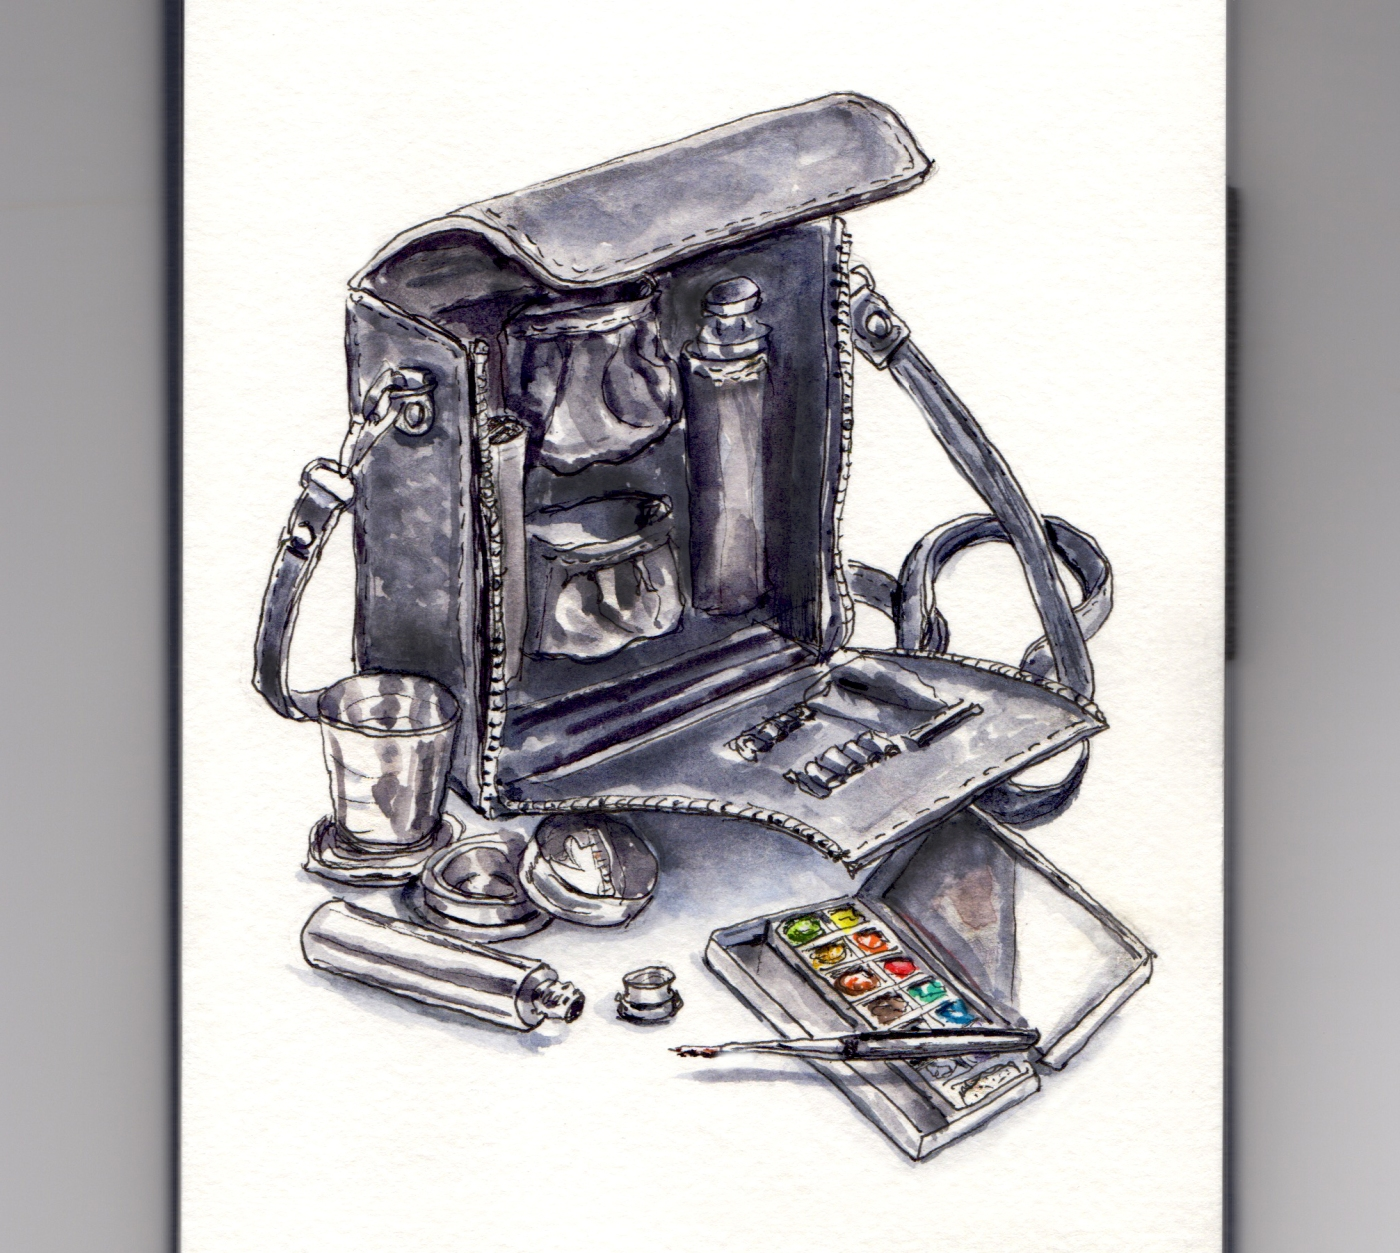 Day 14 #WorldWatercolorGroup My Travel Paint Kit - Joe Miller's Travel Painter Set from Cheap Joe's Art Stuff